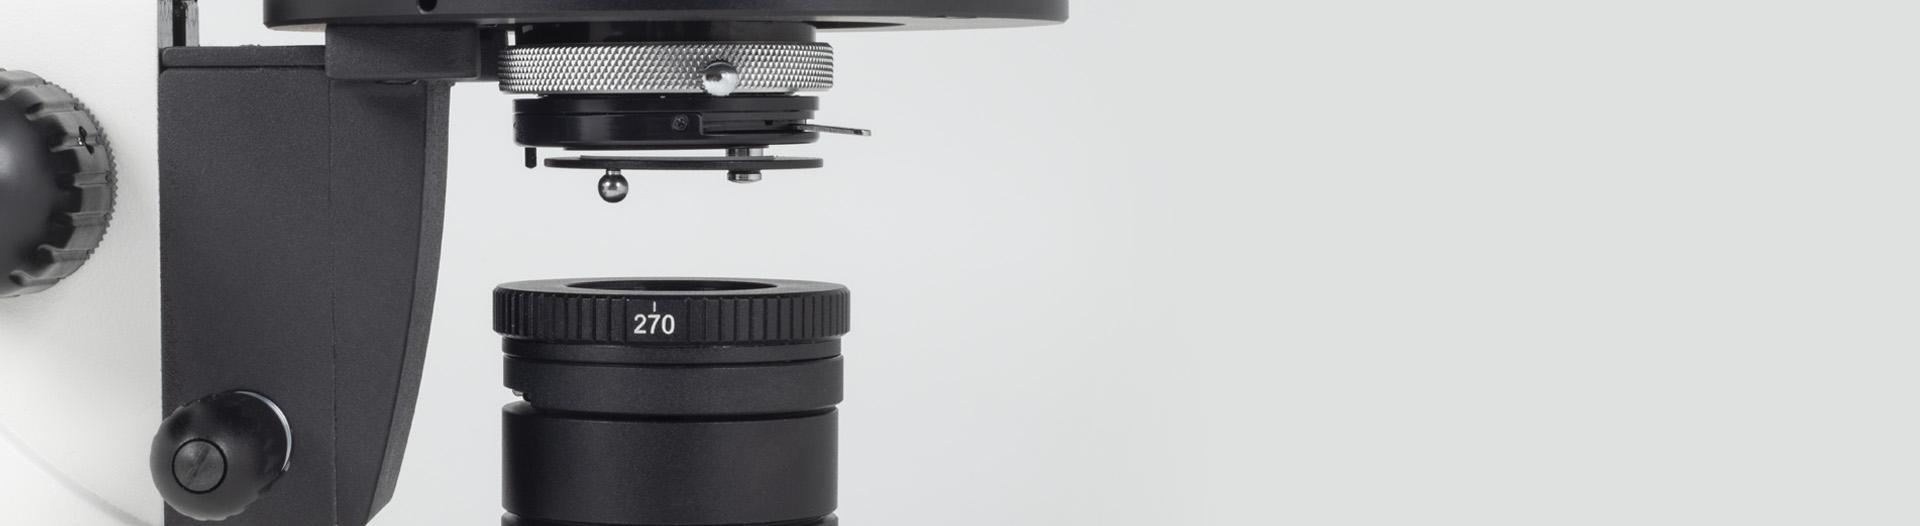 PM microscope Illumination